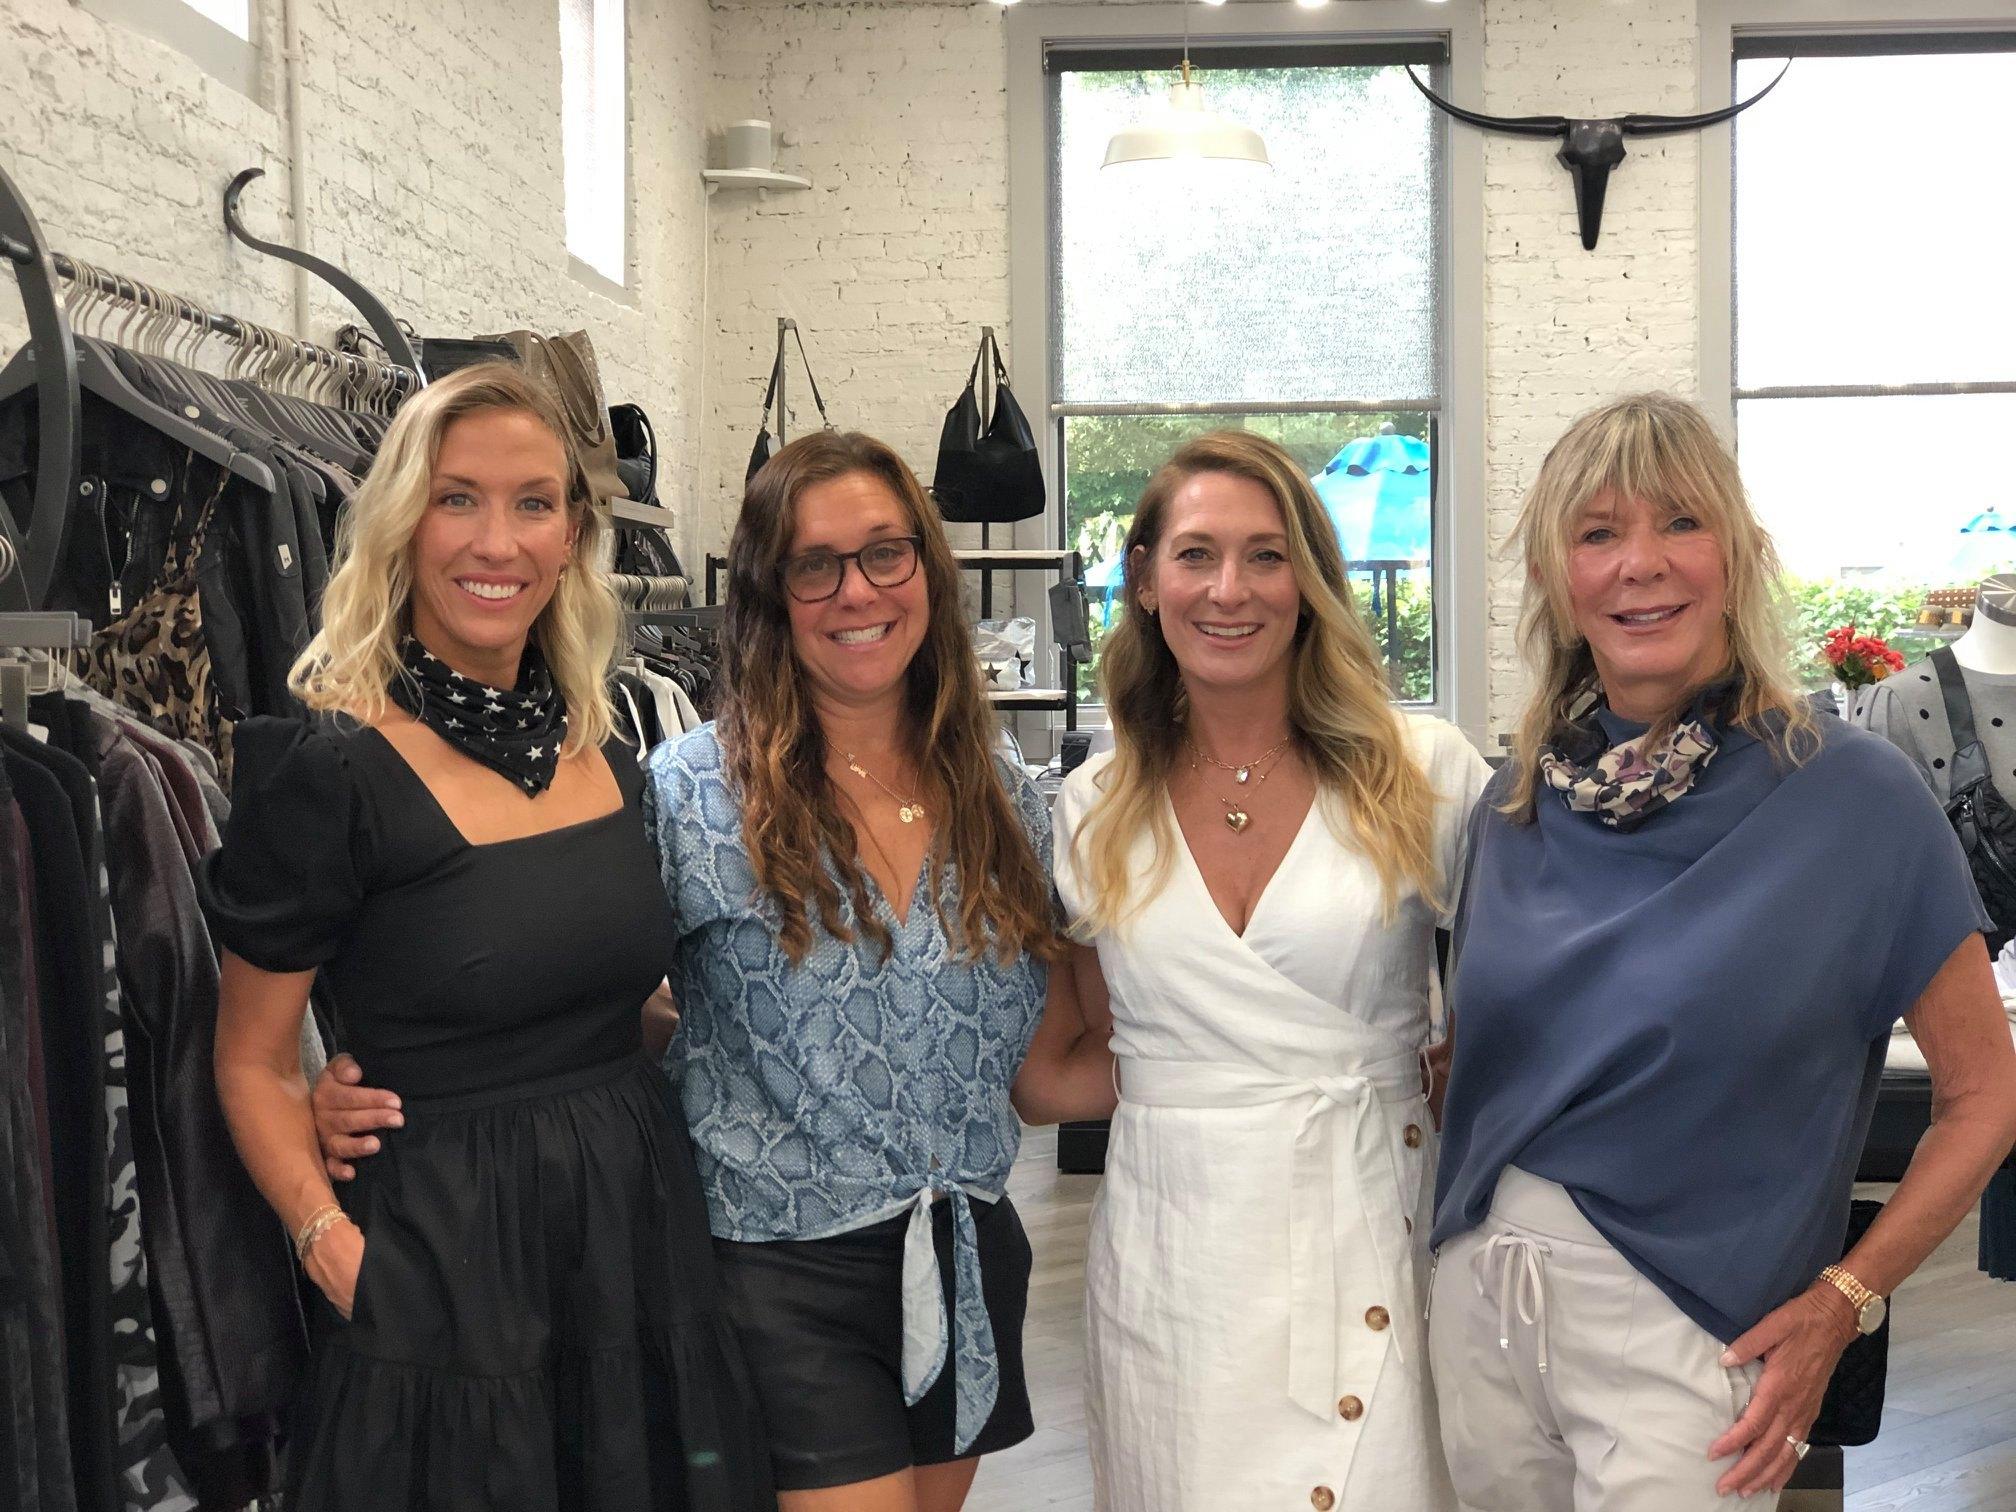 L to R: Samantha Shapiro, Melinda Kaplan, Lena Blitstein, Susan Lurie